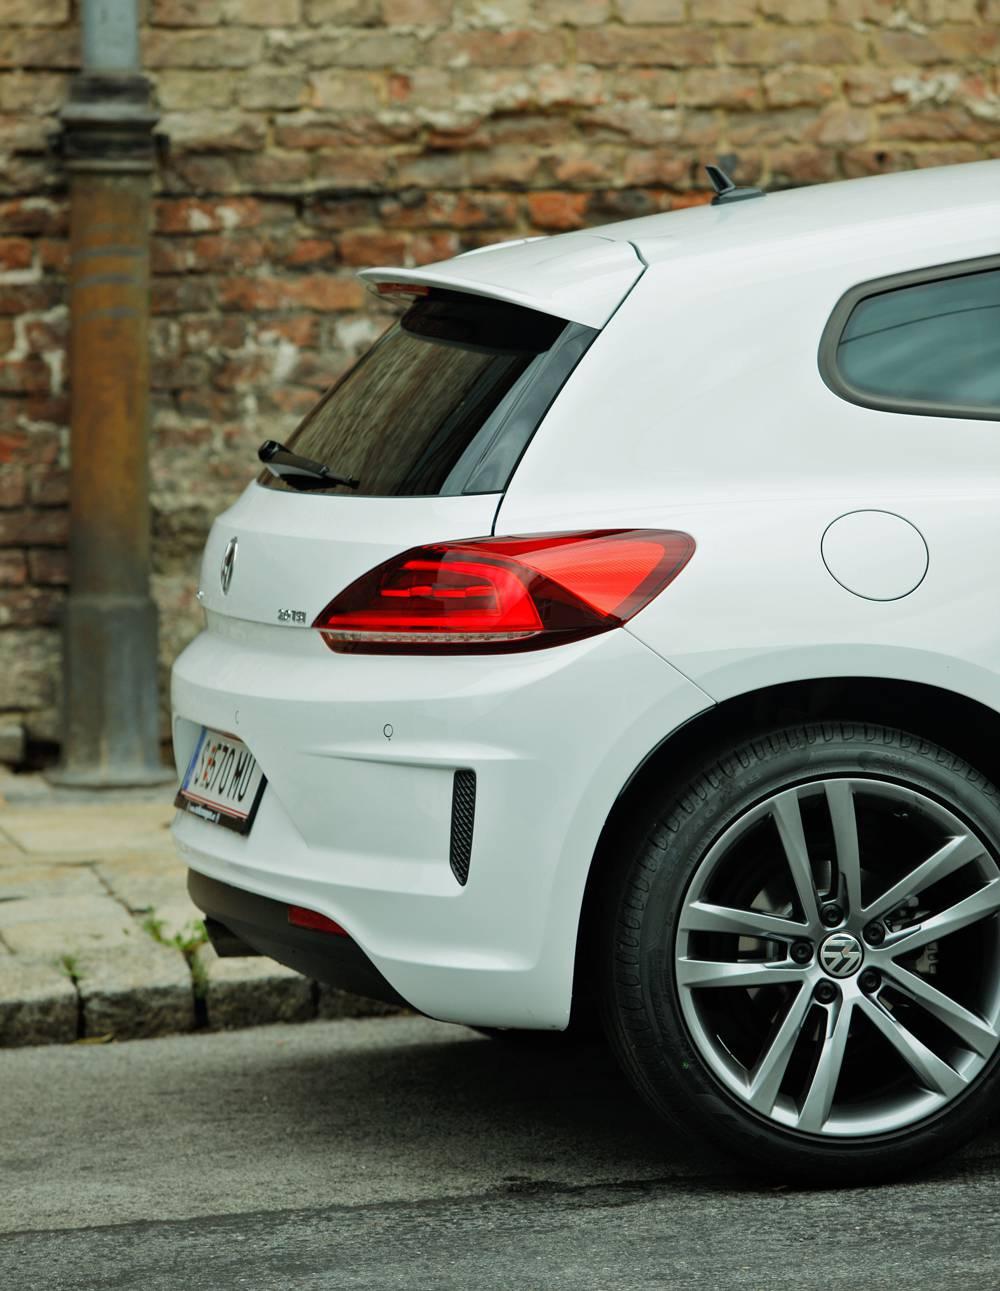 _VW-Scirocco-sport-tsi-dsg-riedmann-2